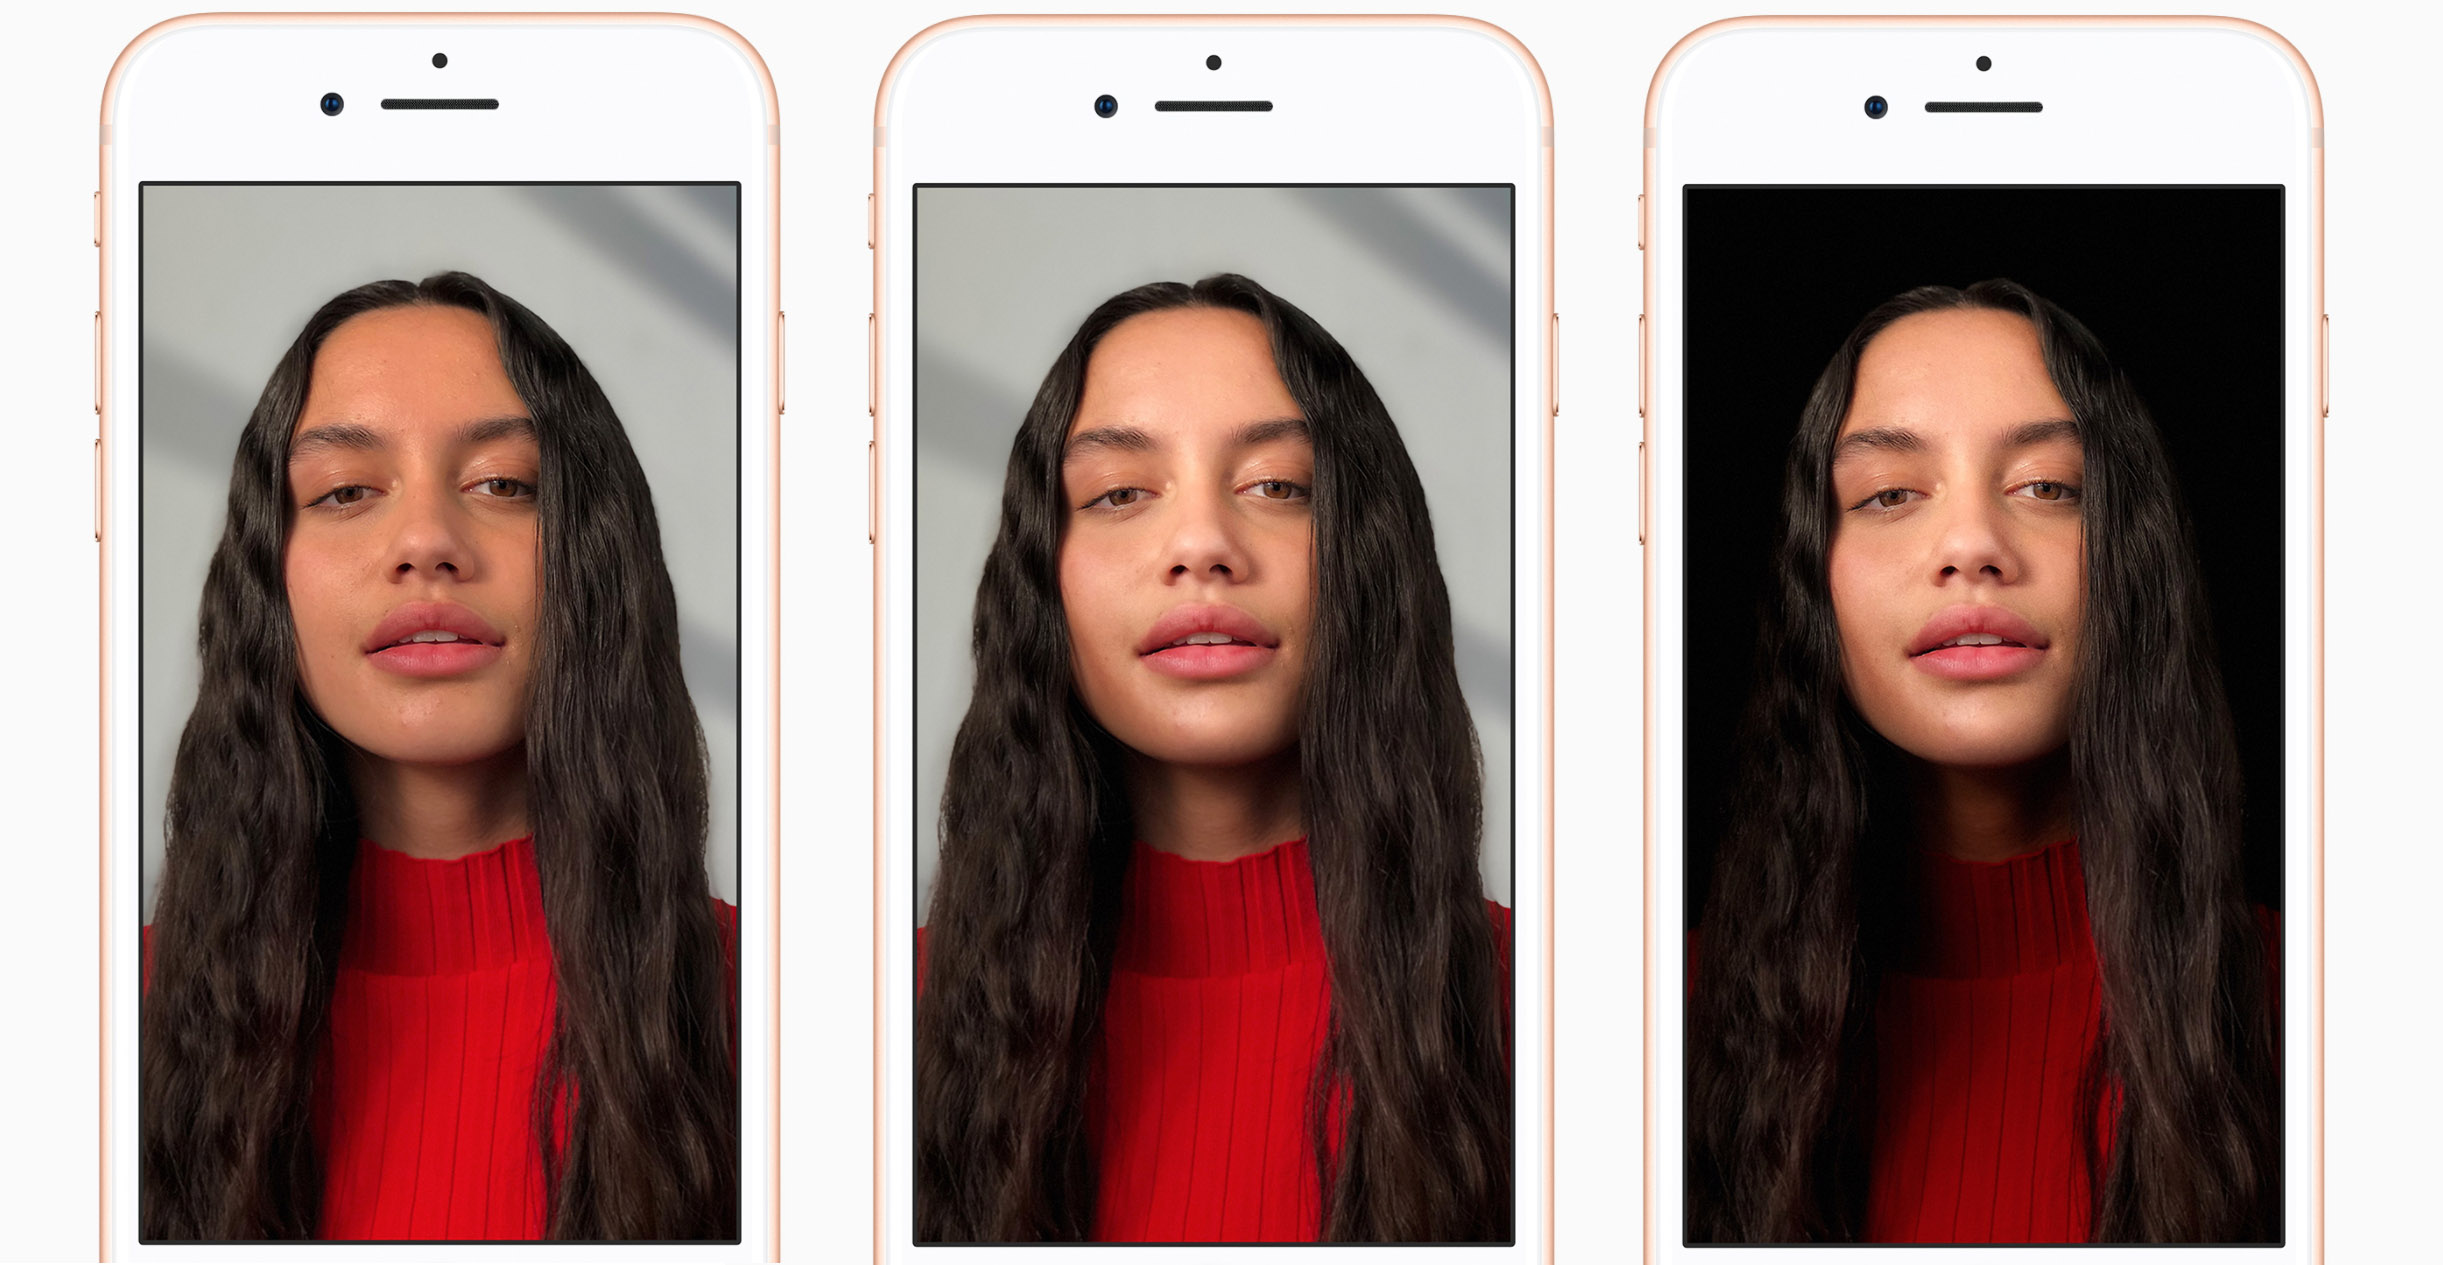 apple-iphone-portrait-mode-2017-09-12-01